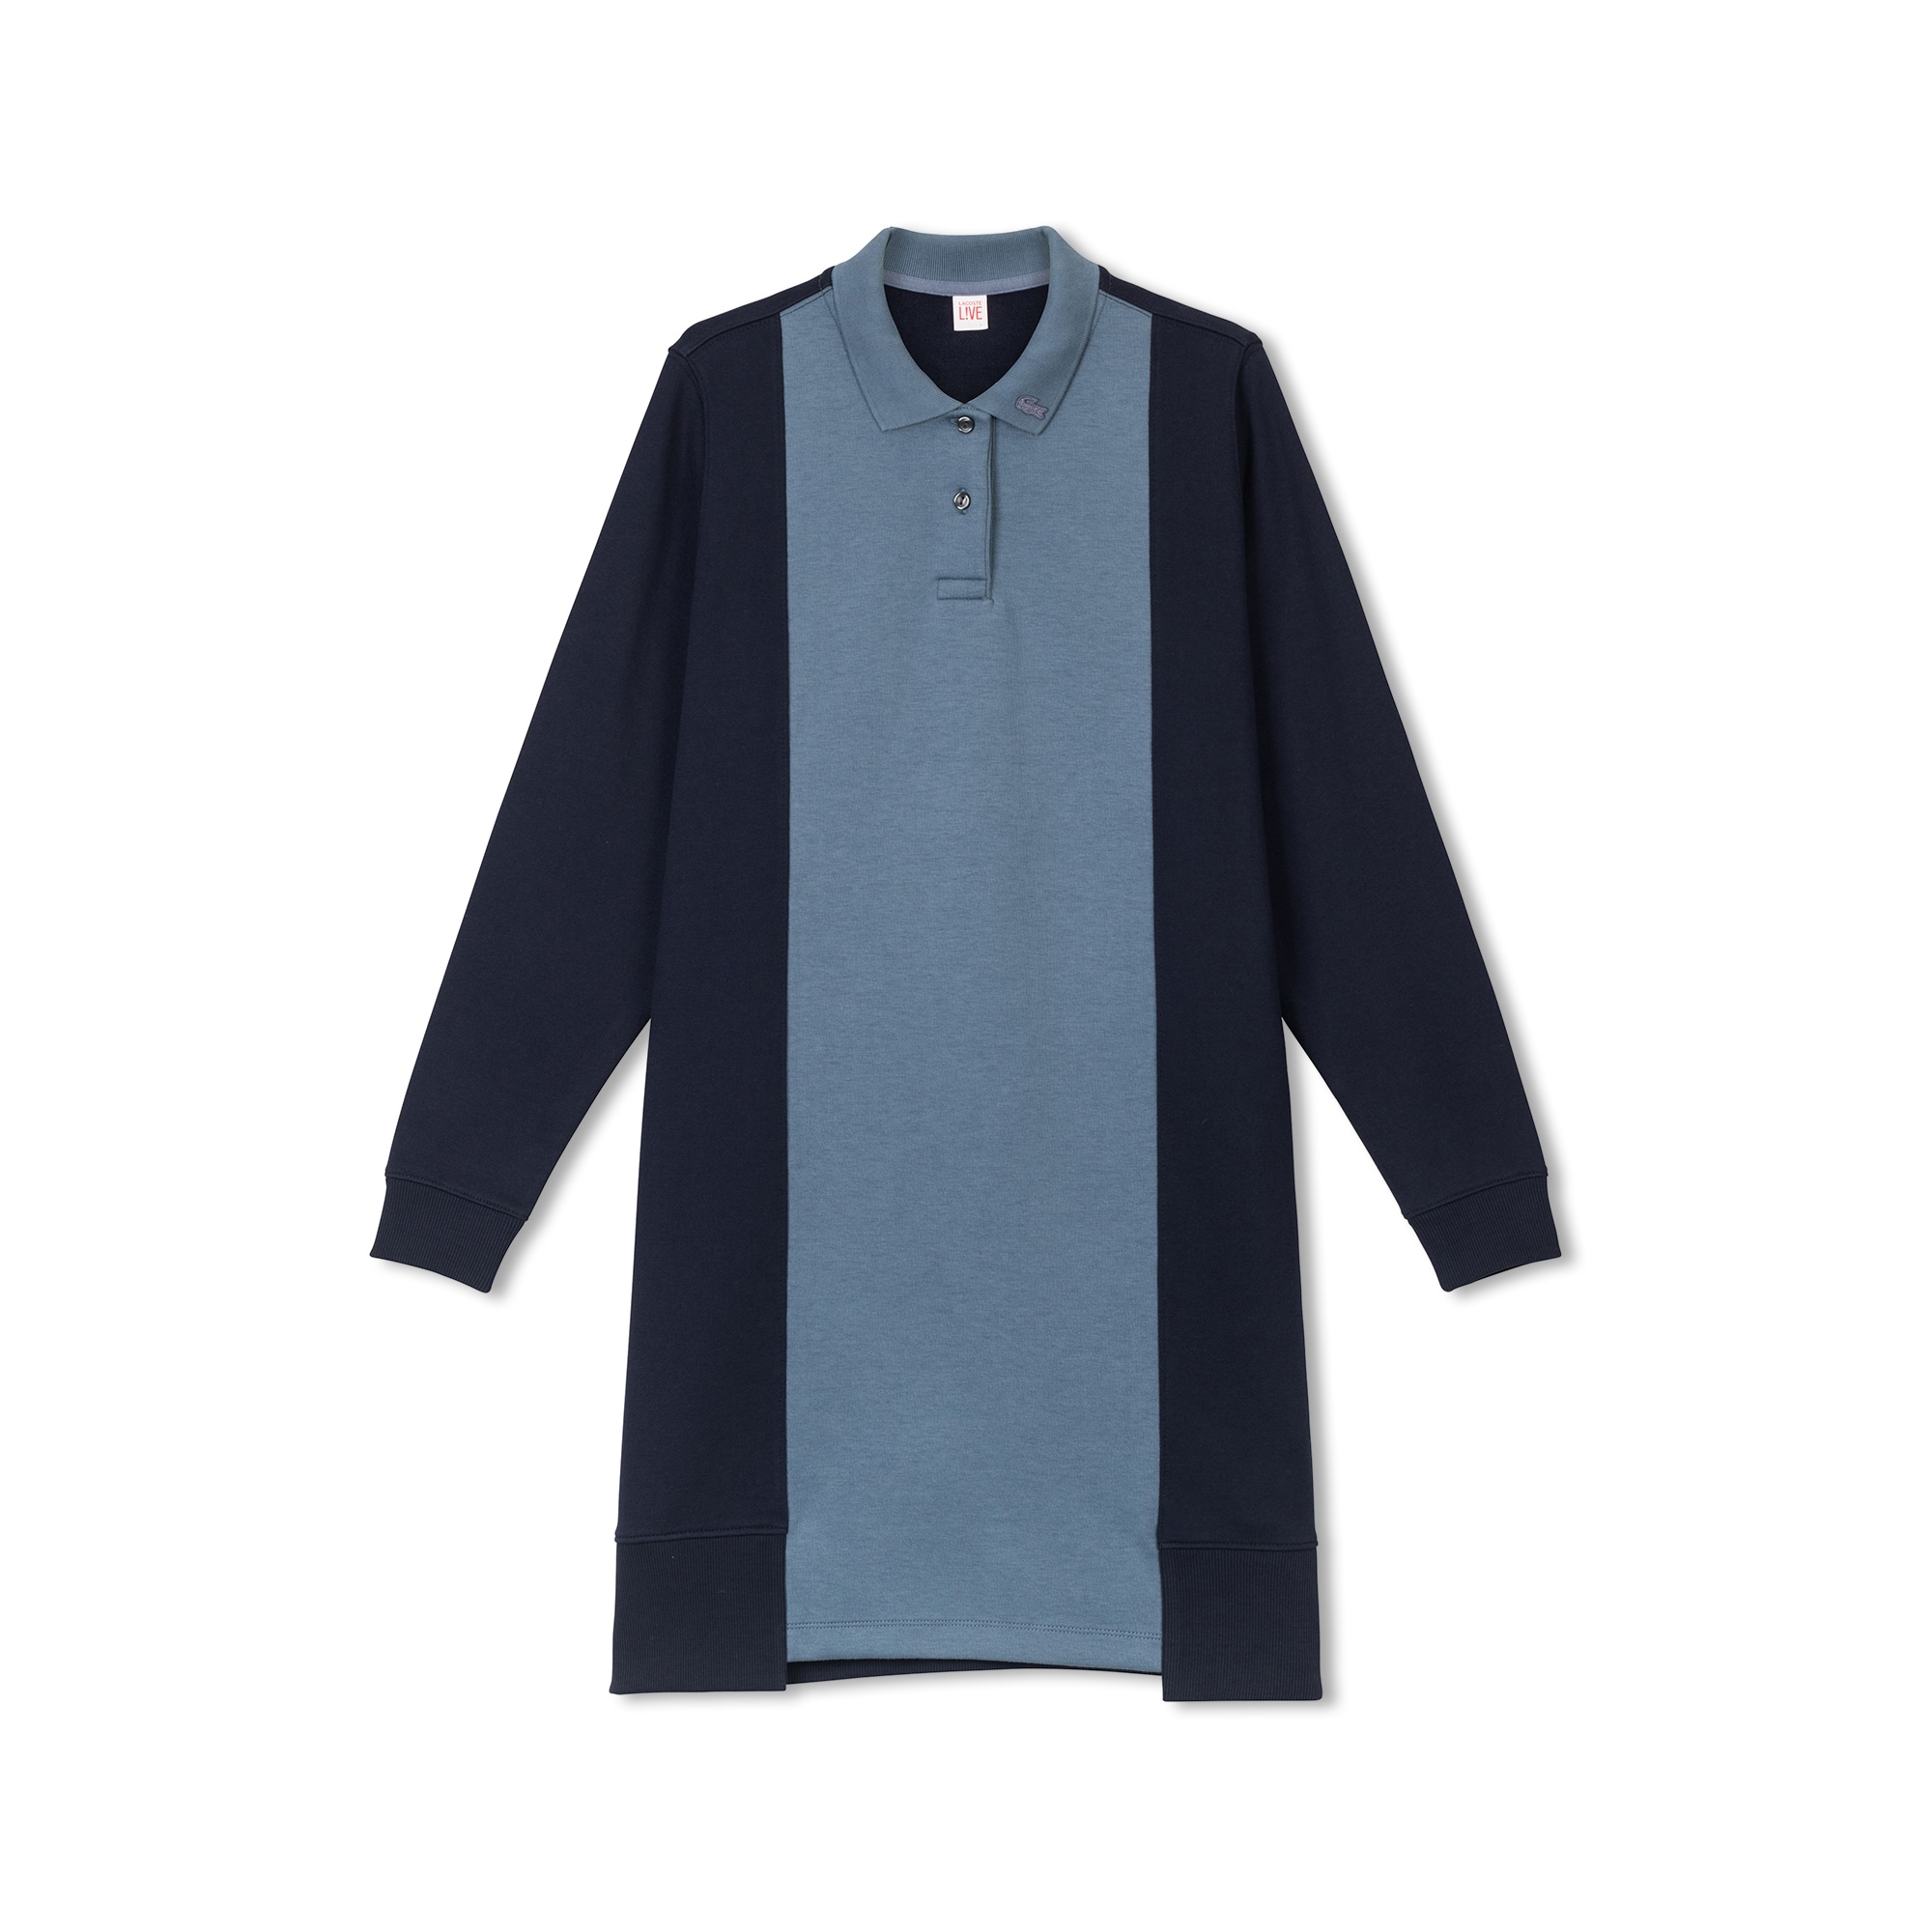 Lacoste LIVE系列撞色布料女士拉绒Polo裙